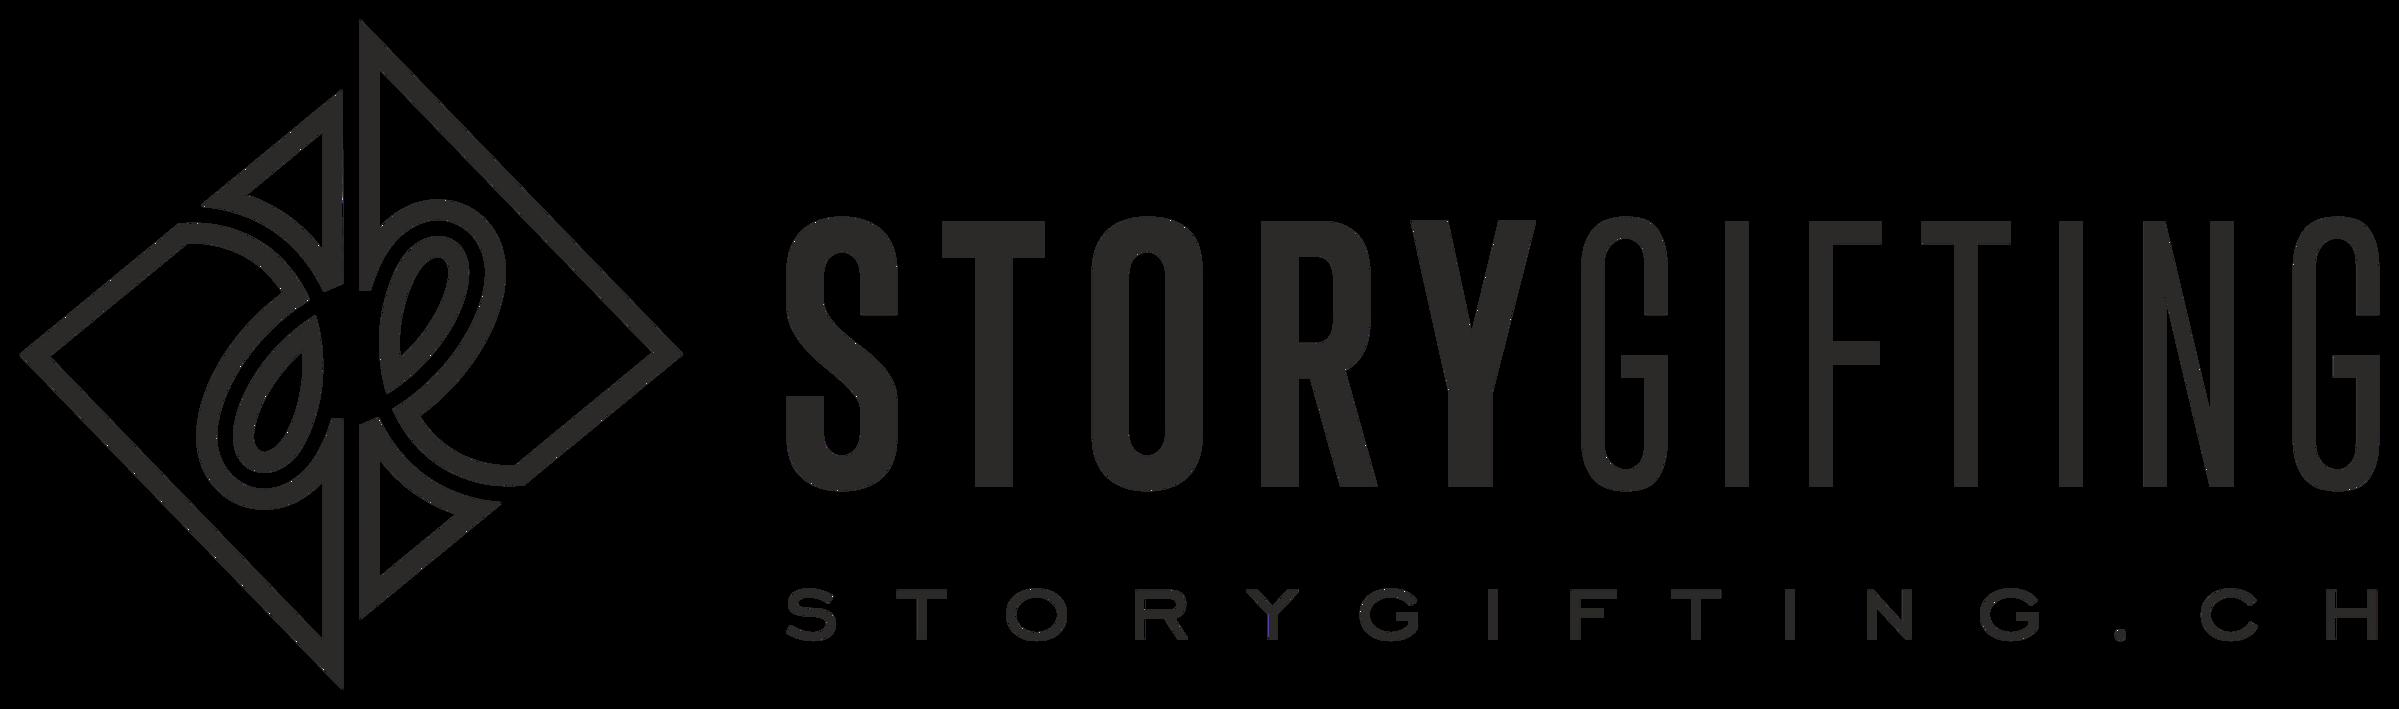 Story Gifting - R. Buchbauer